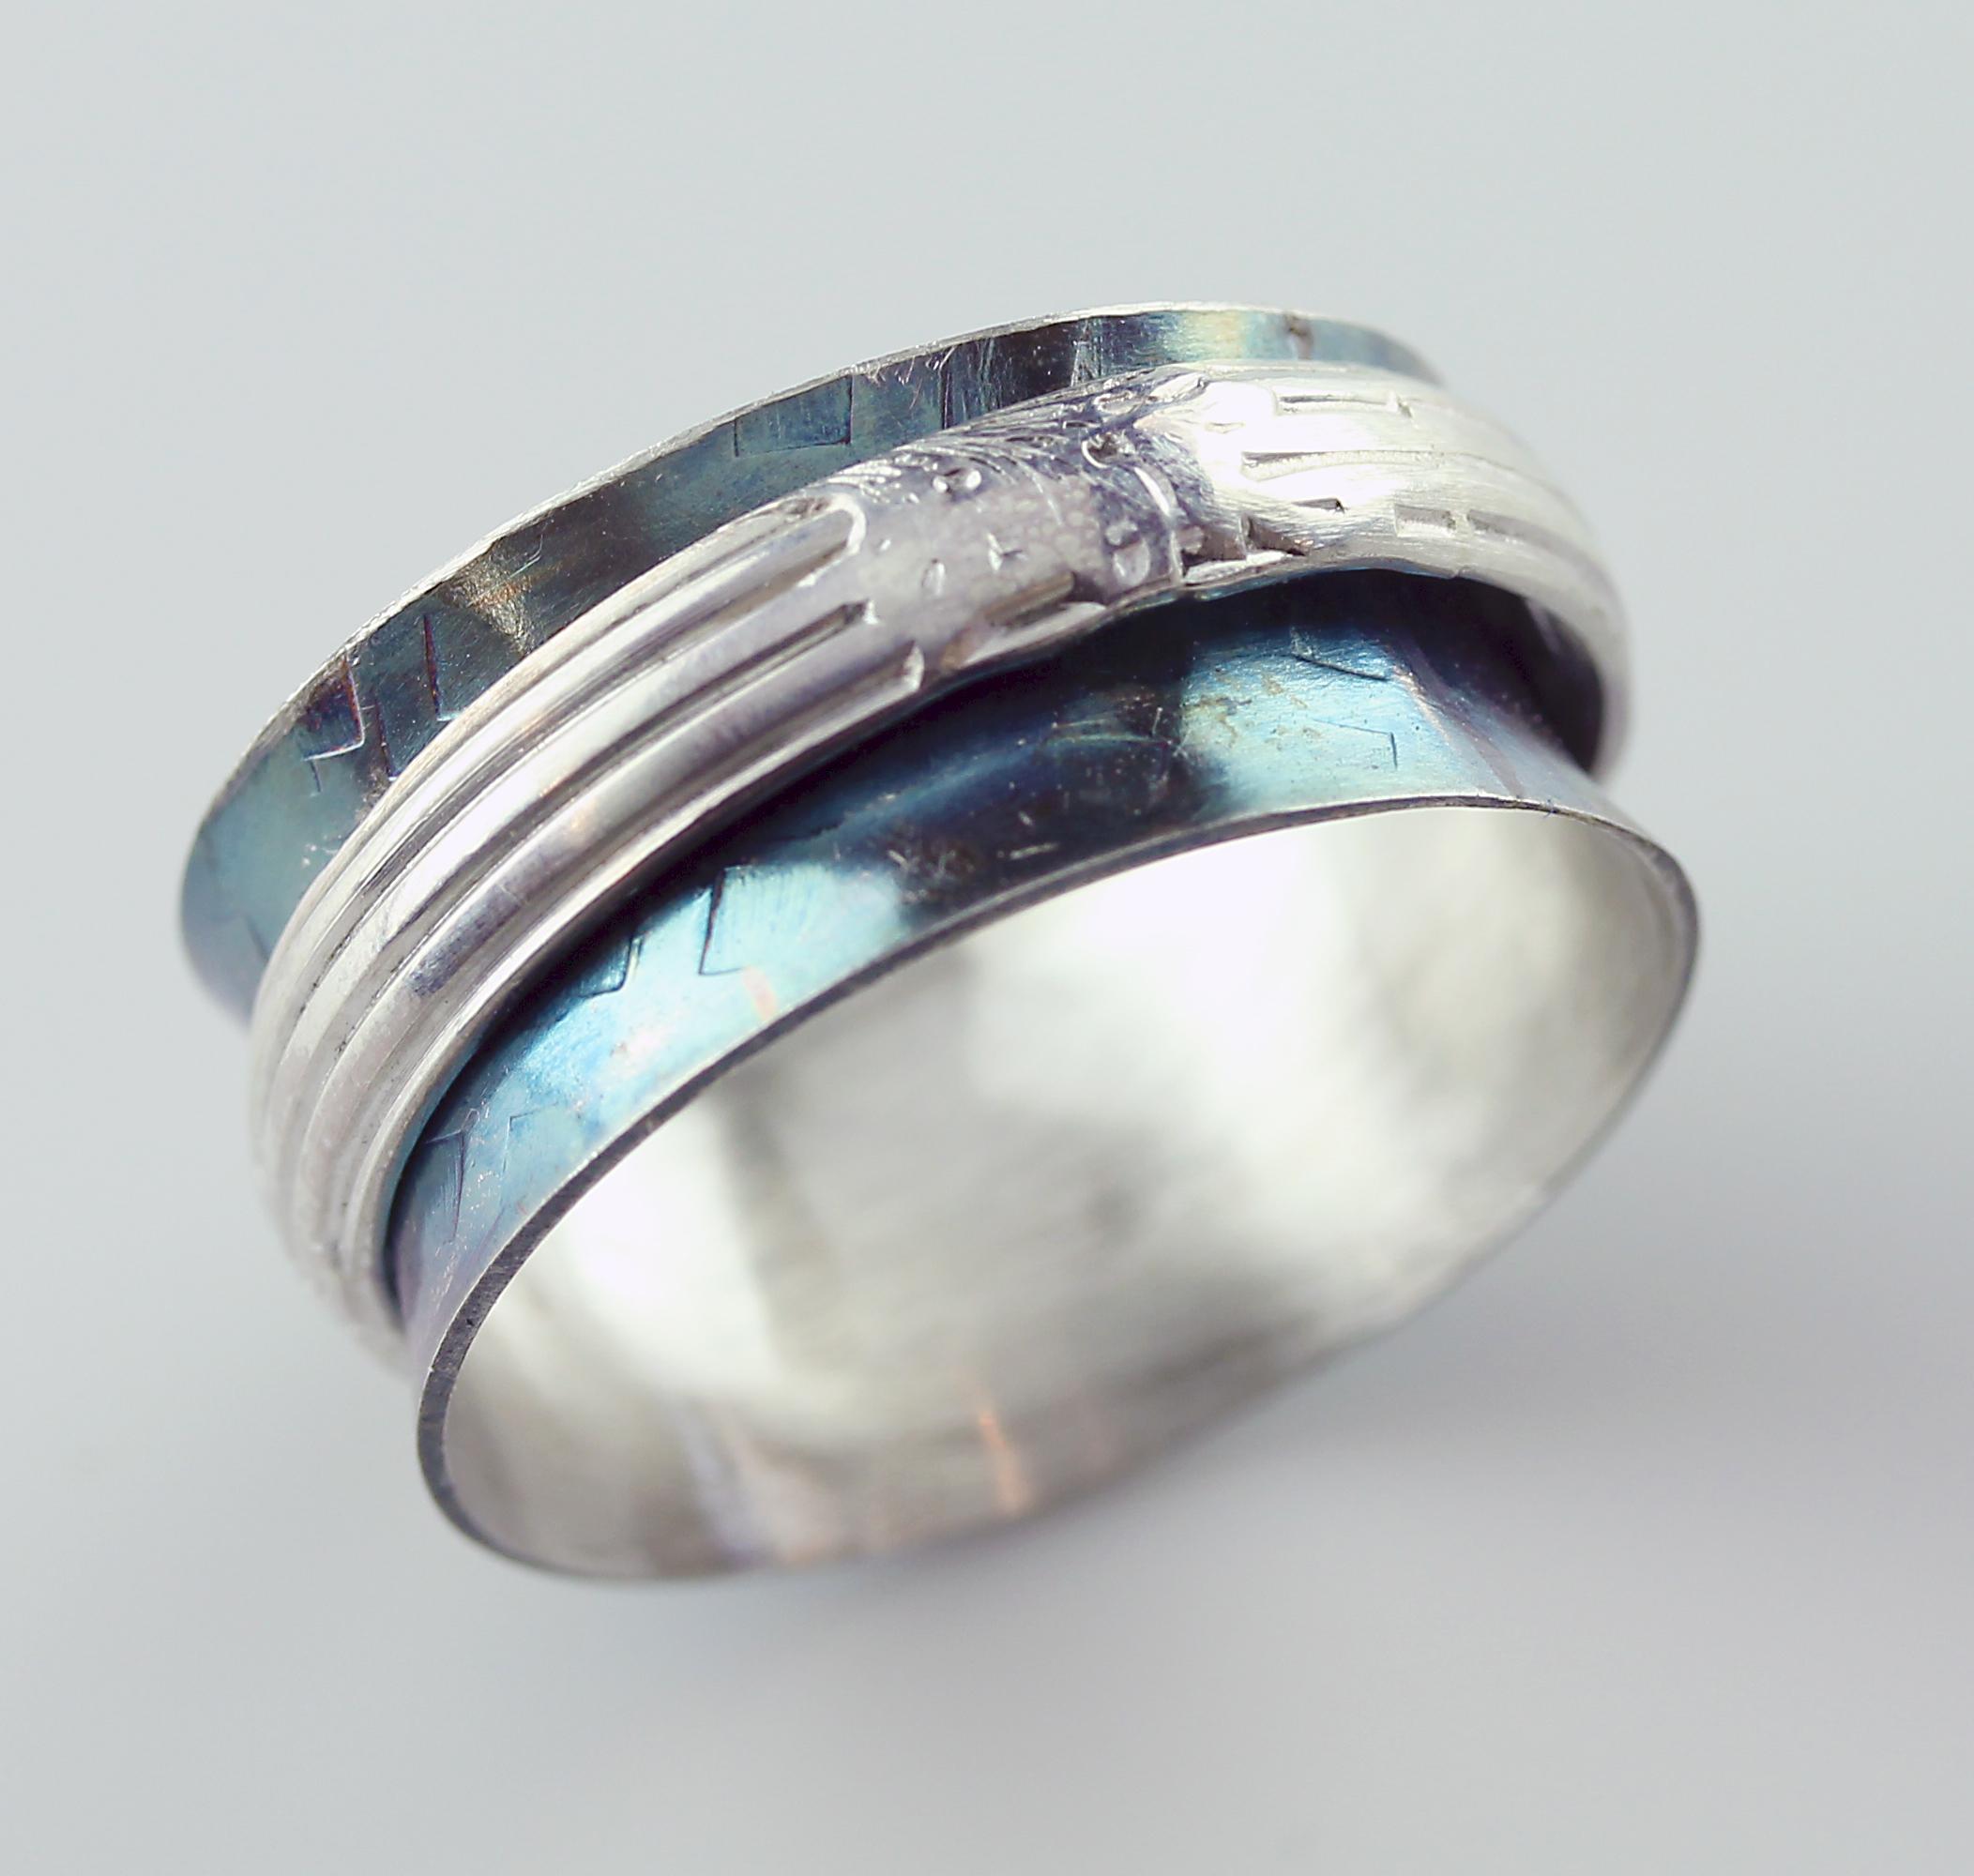 2/03/2017 10:30am - 6:00pm Janet Alexander Argentium Spinner Ring